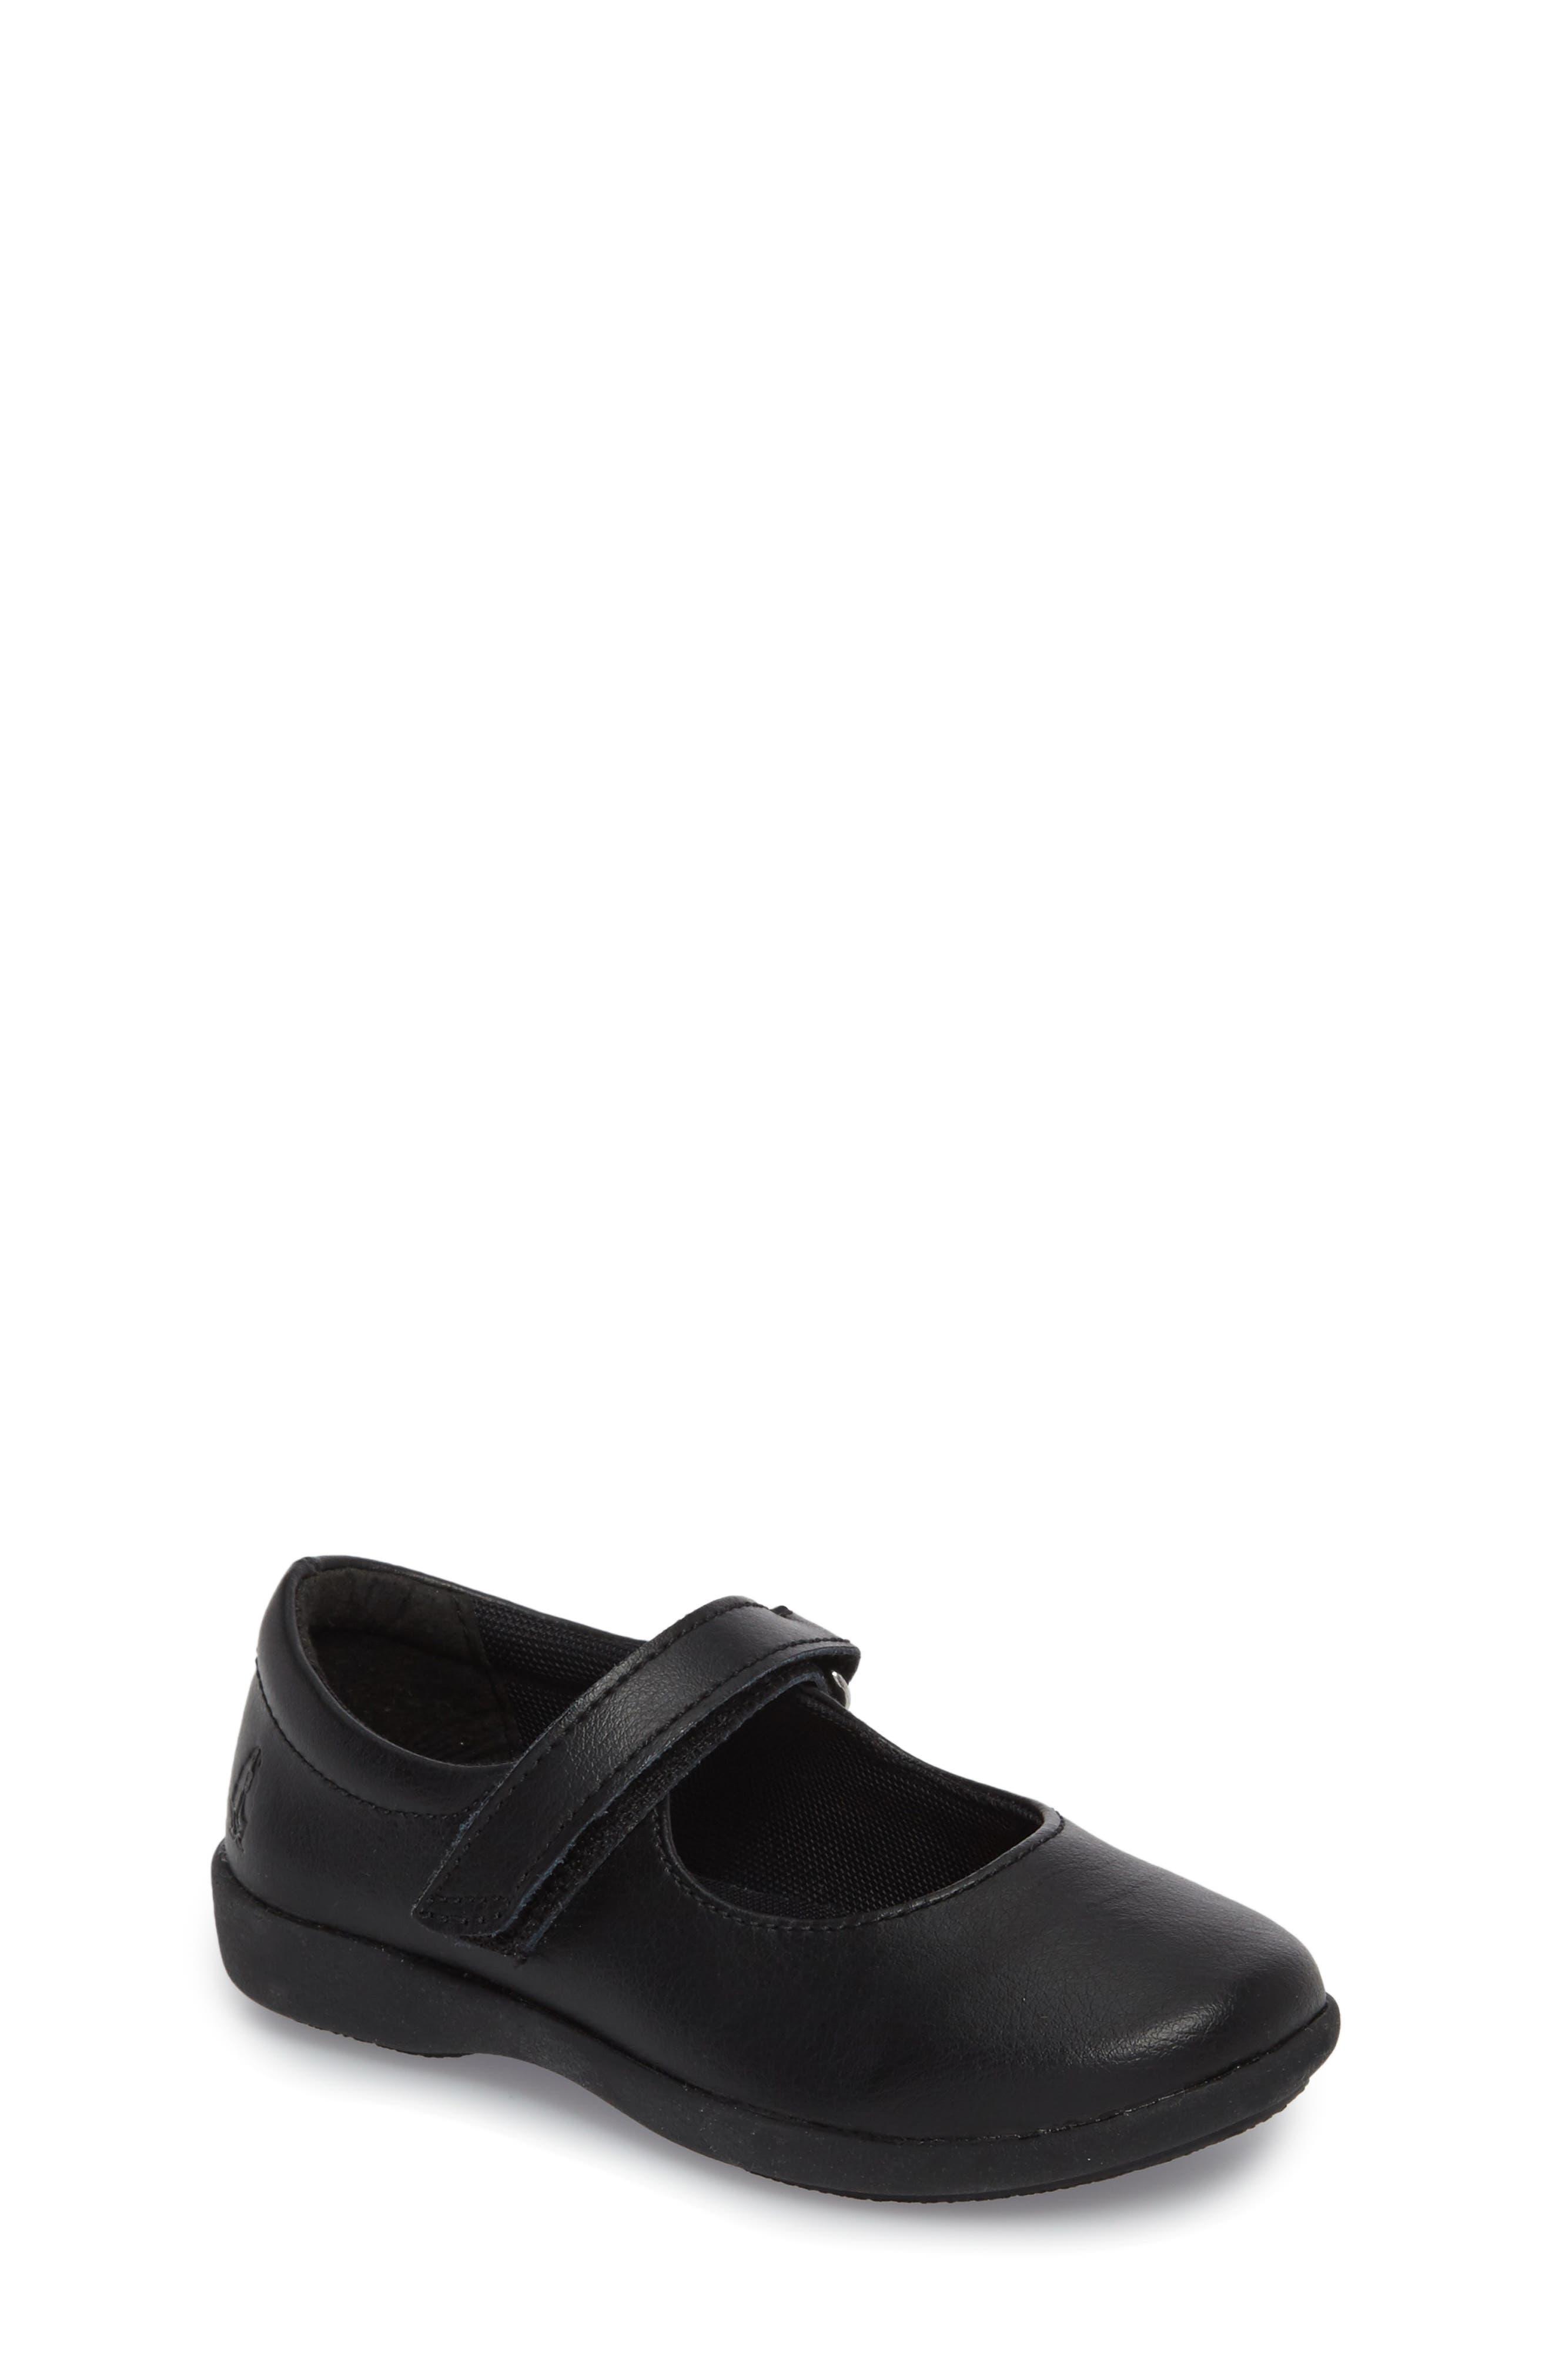 Girls Hush Puppies Lexi Mary Jane Flat Size 125 M  Black